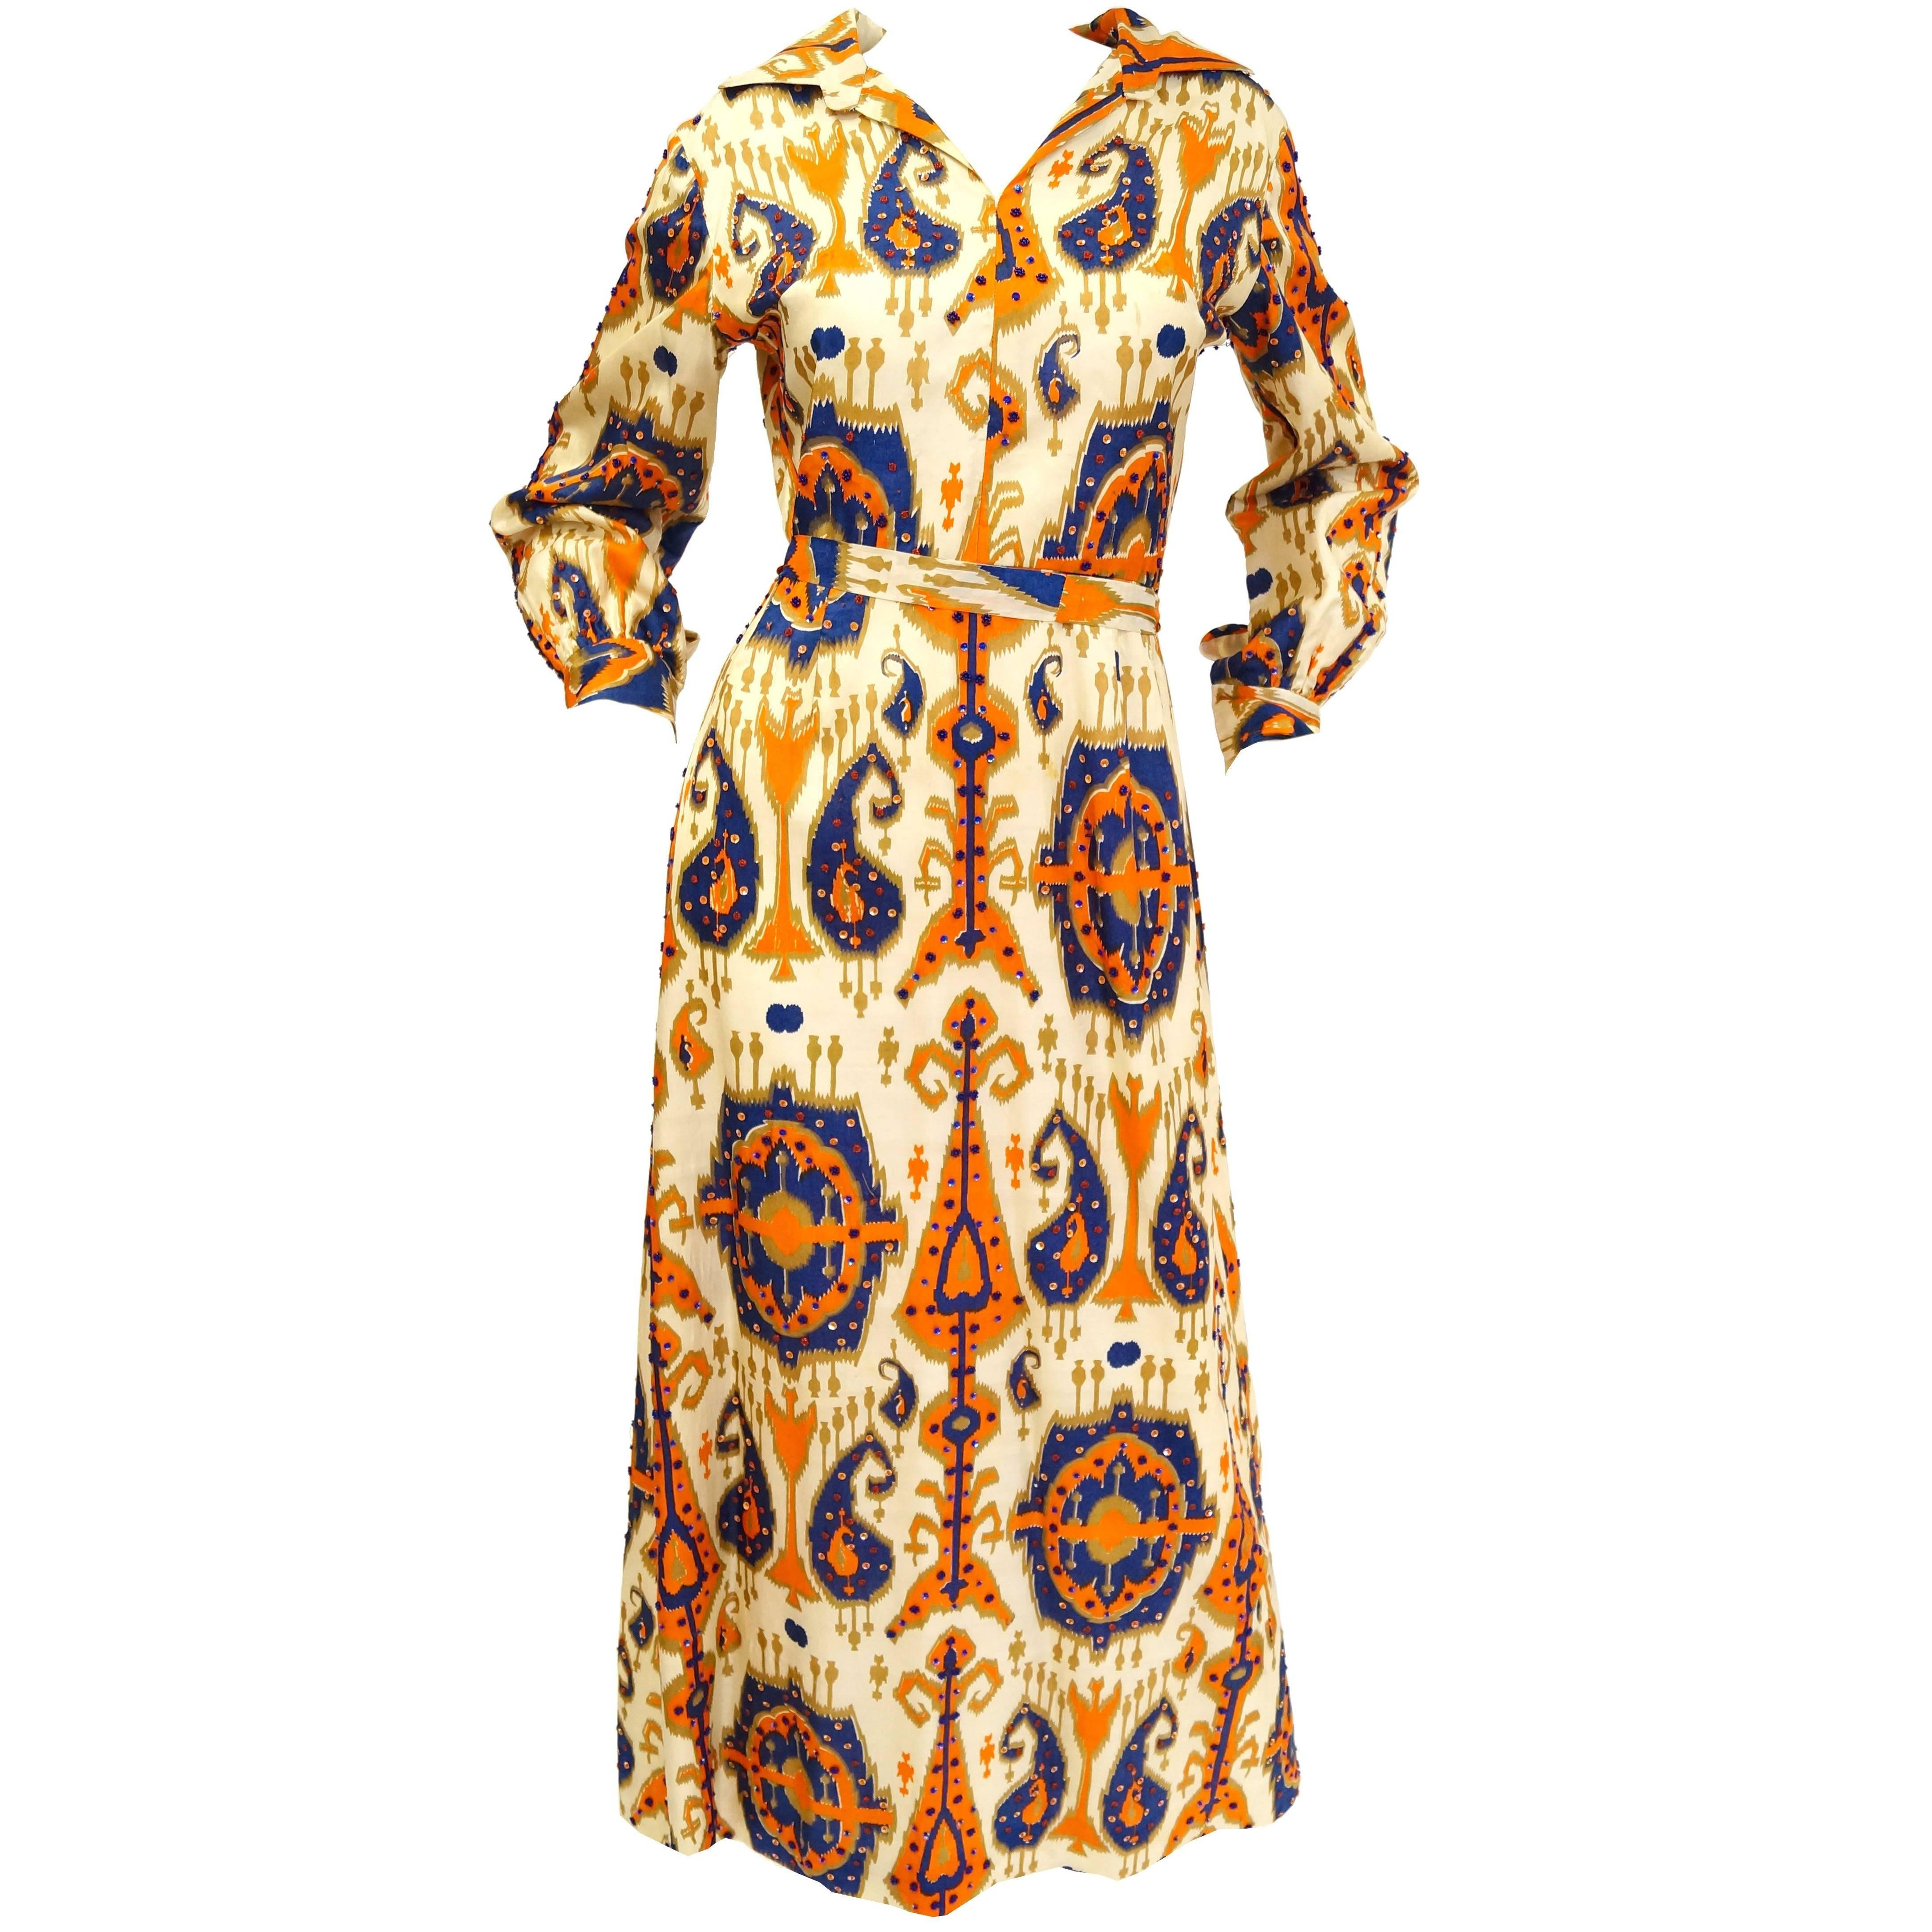 Paisley Ikat Silk Beaded and Sequin Hostess Dress, 1970s